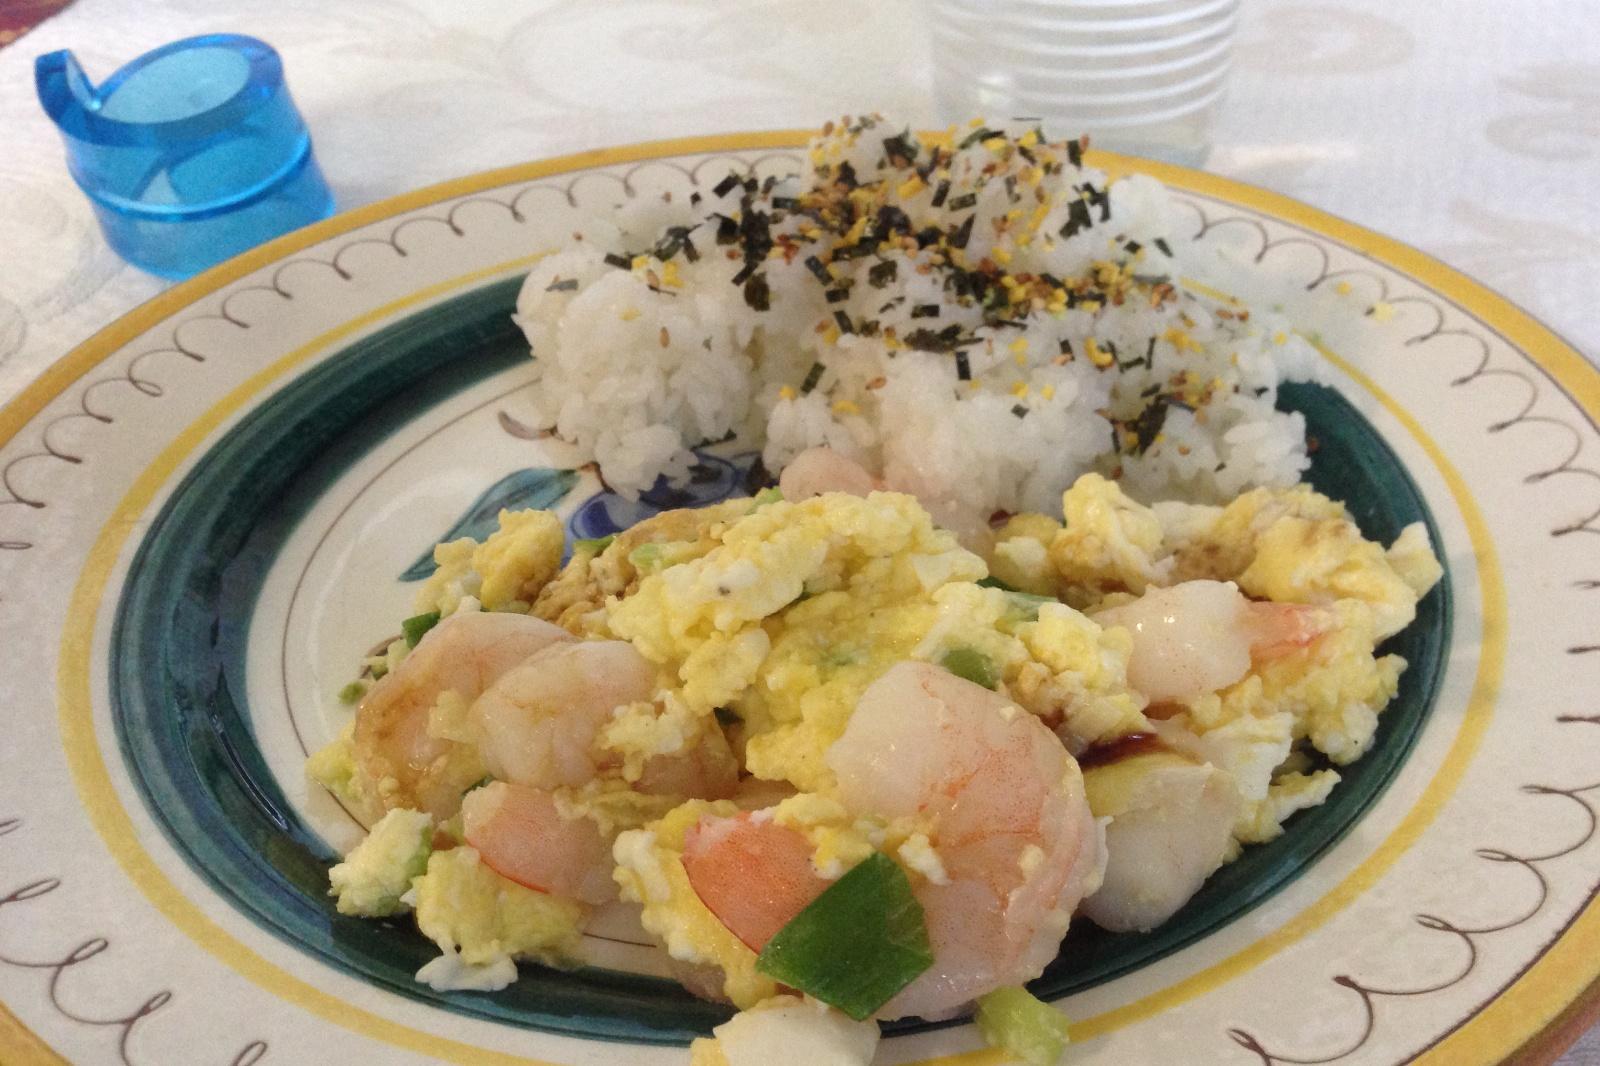 http://blog.rickk.com/food/2014/07/20/ate.2014.07.20.l.jpg